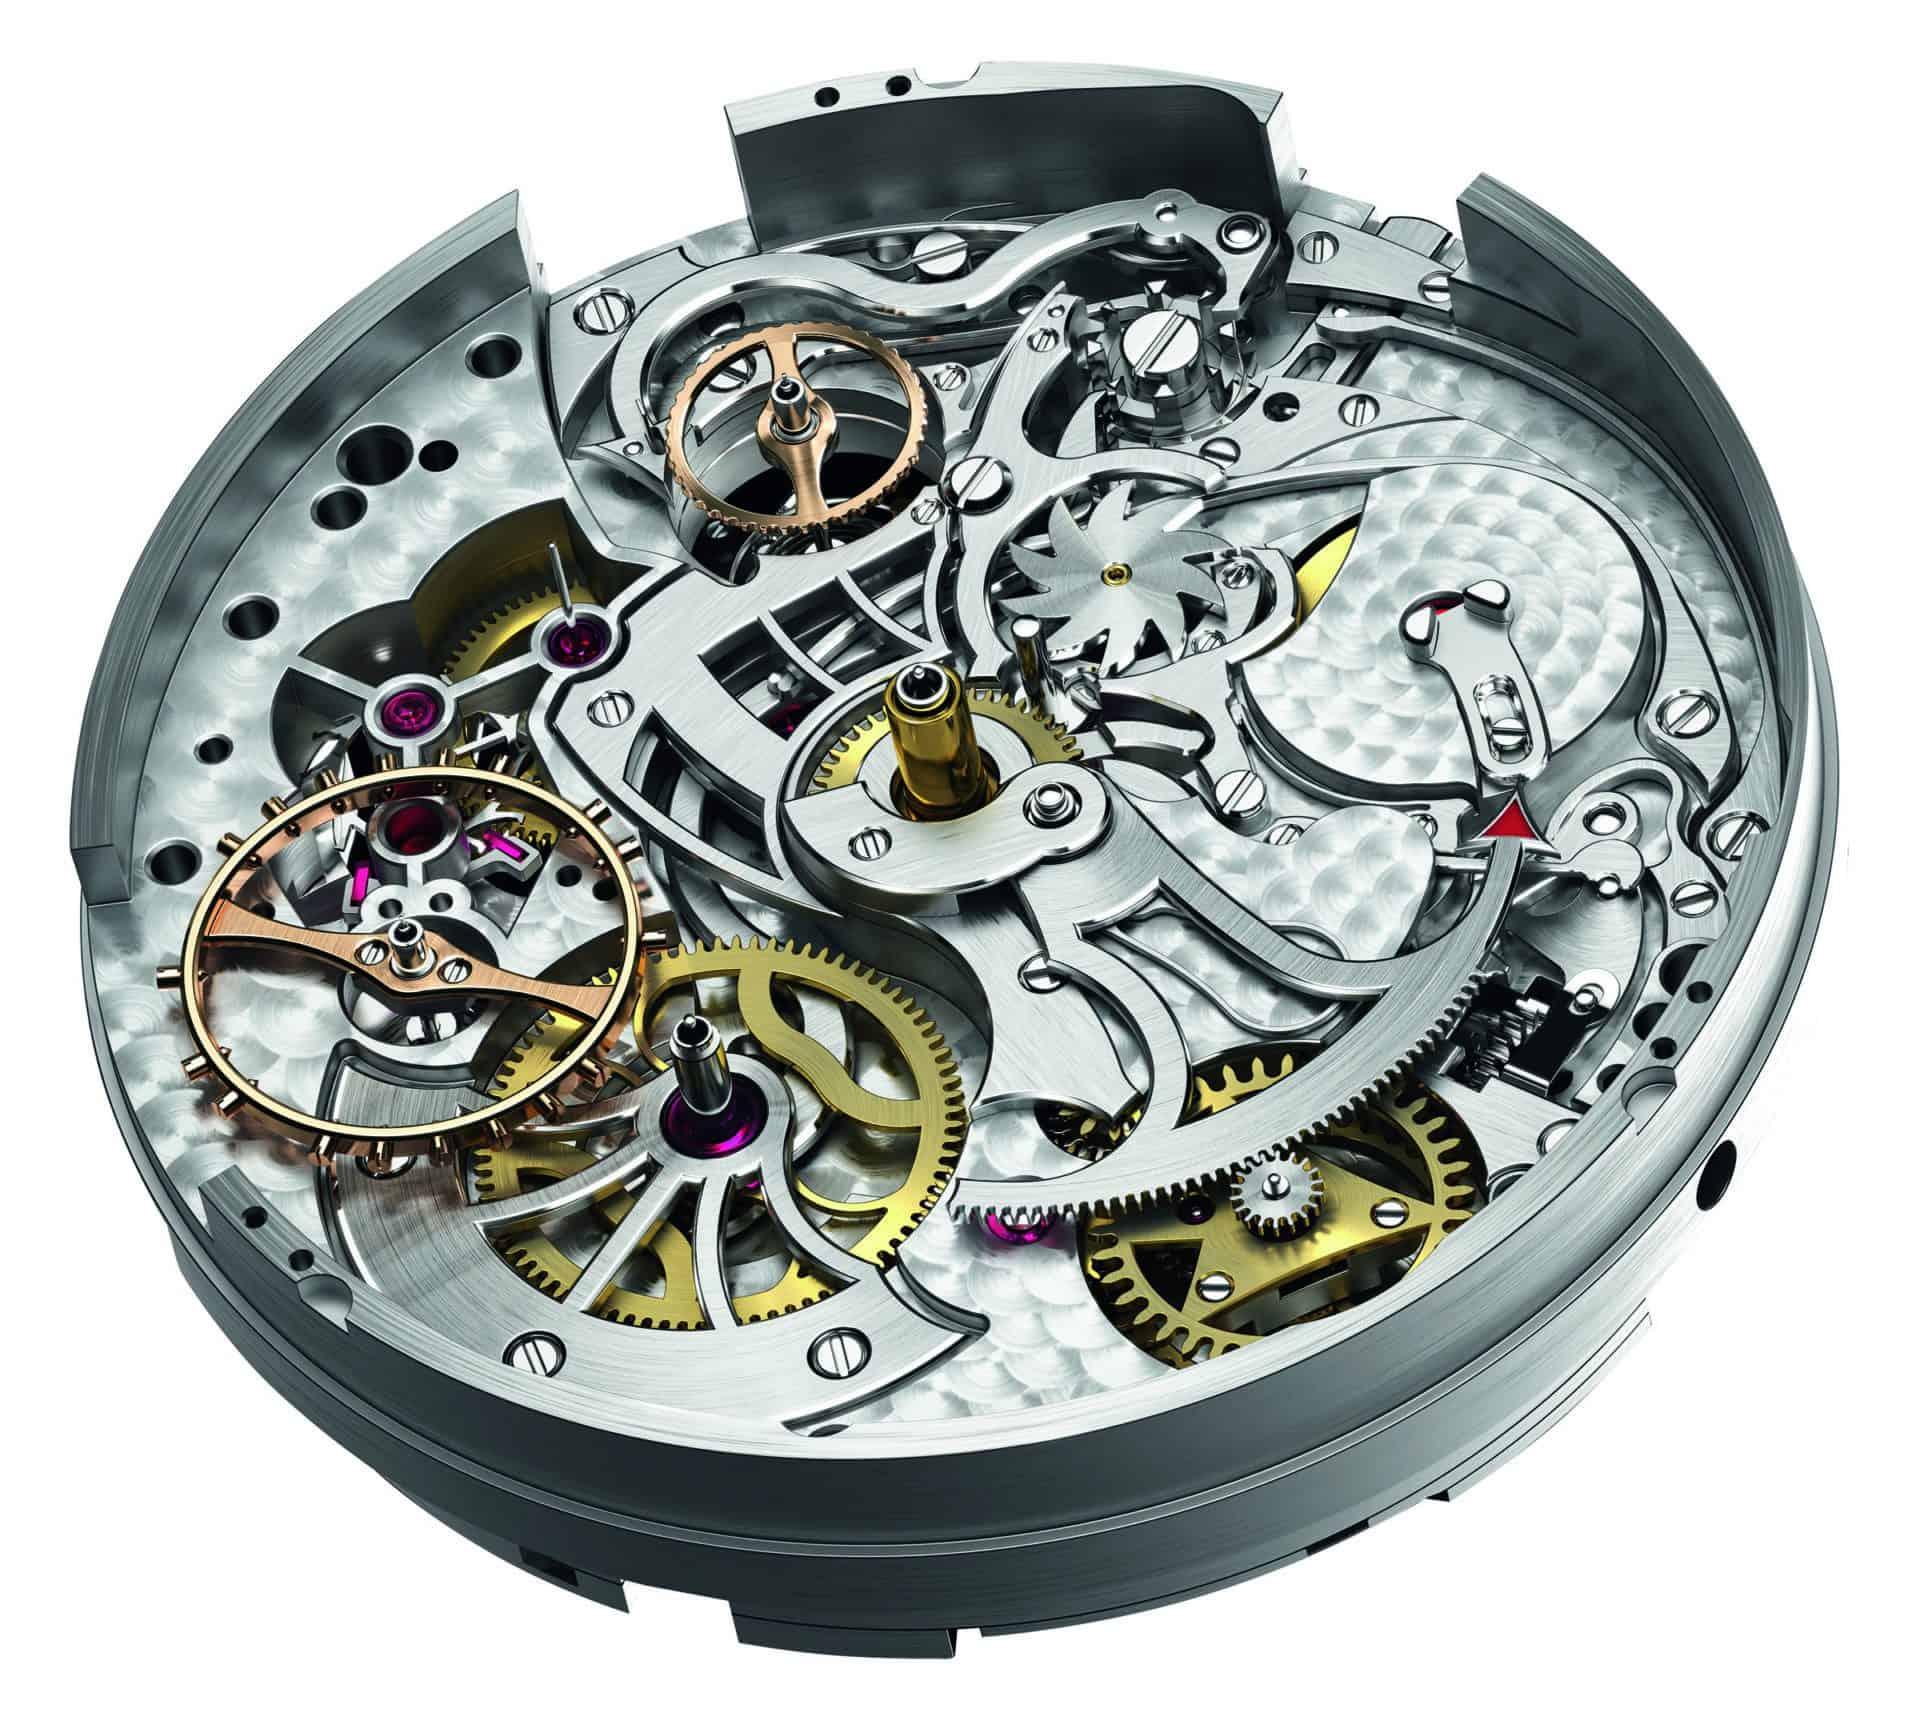 Montblanc TimeWalker 1000 116828 Movement Dial